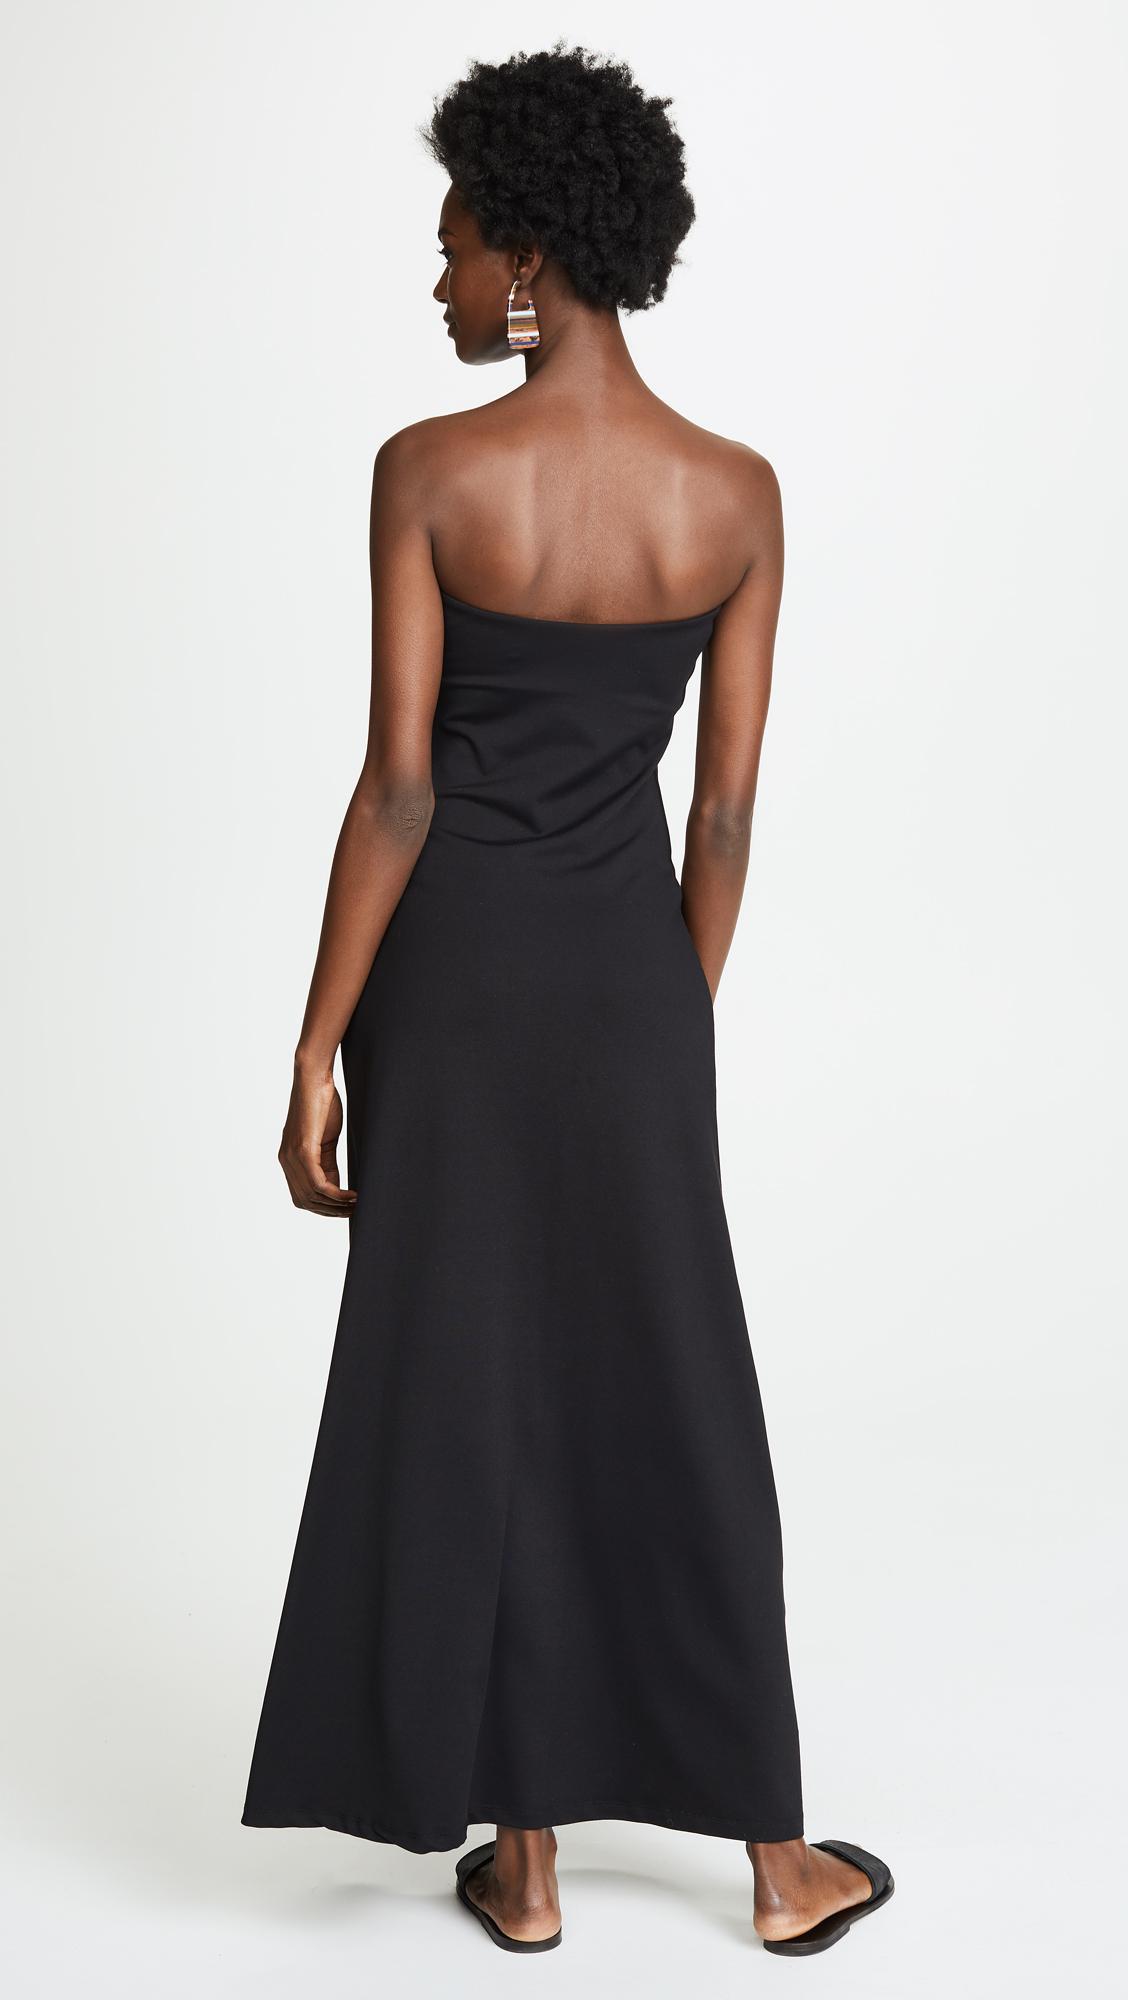 2e3fbc906a39c Susana Monaco - Black Strapless Maxi Dress - Lyst. View fullscreen